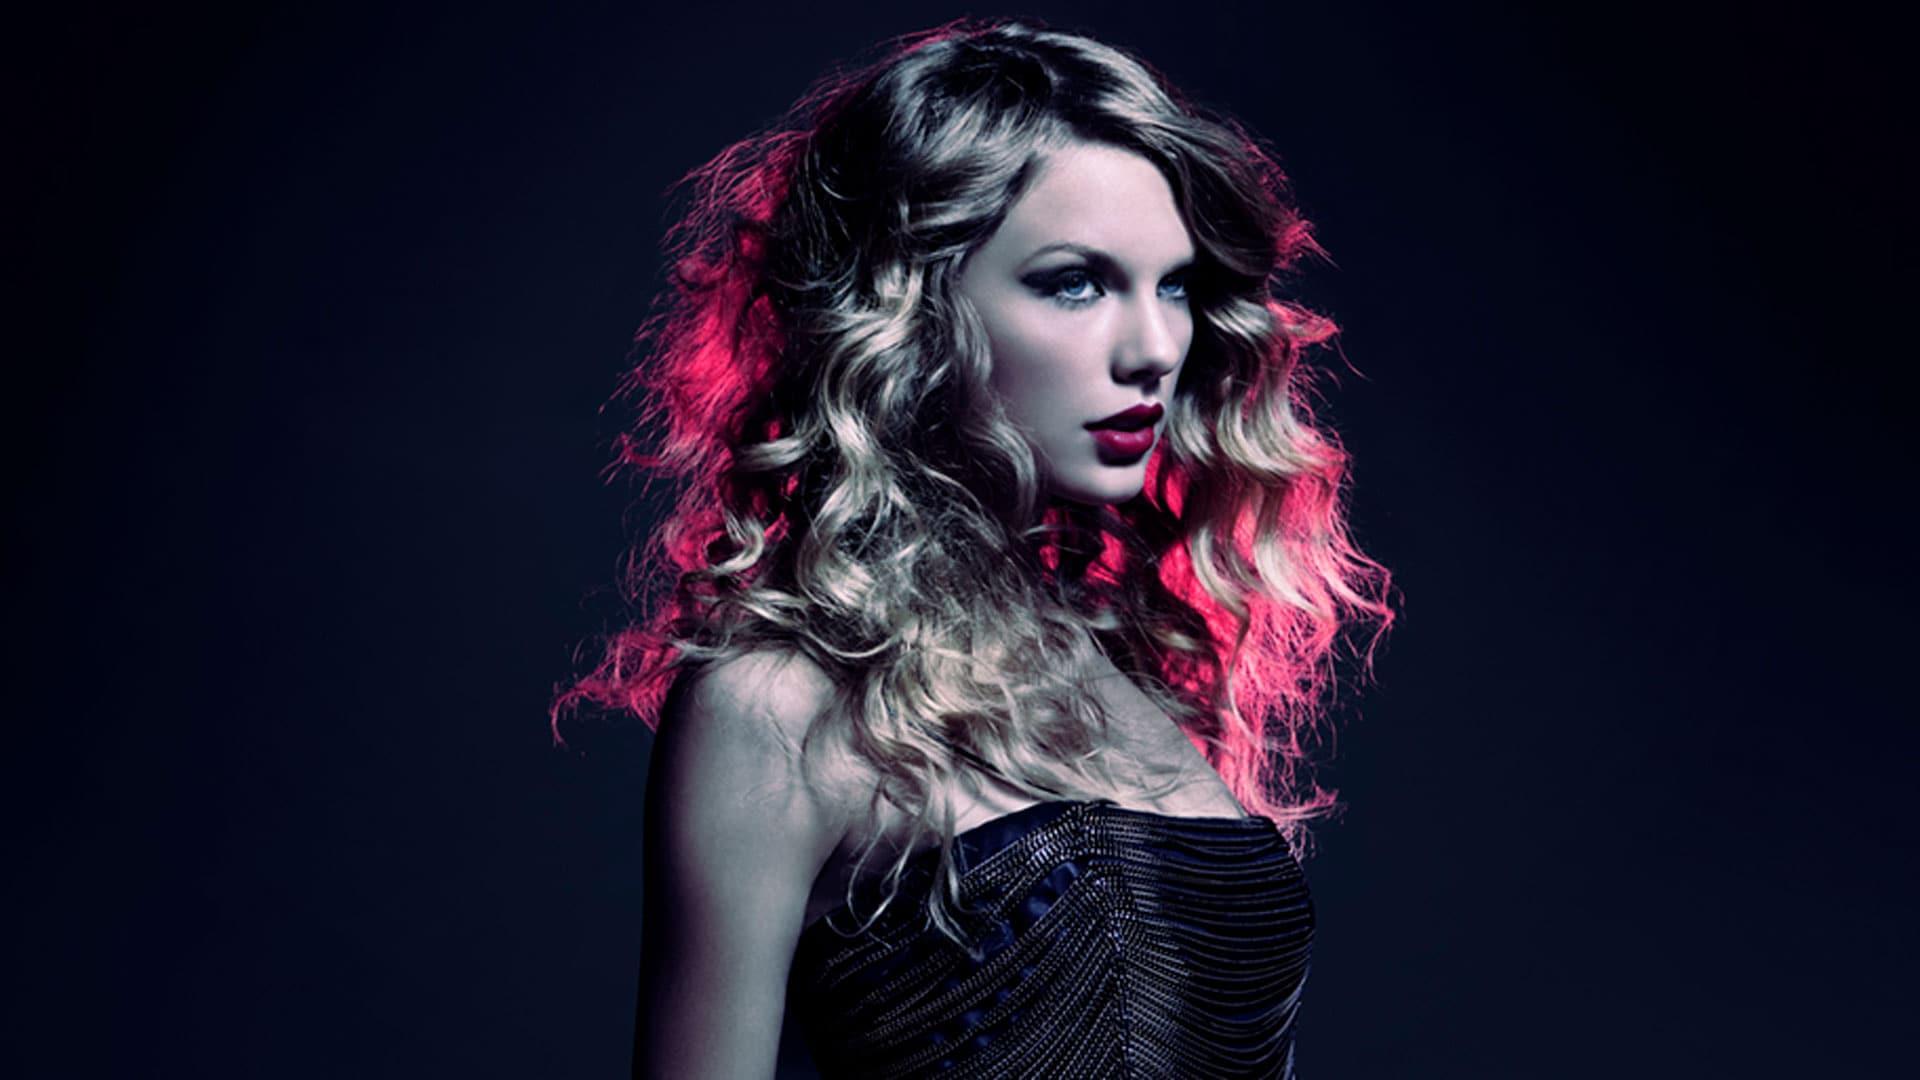 Taylor Swift: November 7, 2009